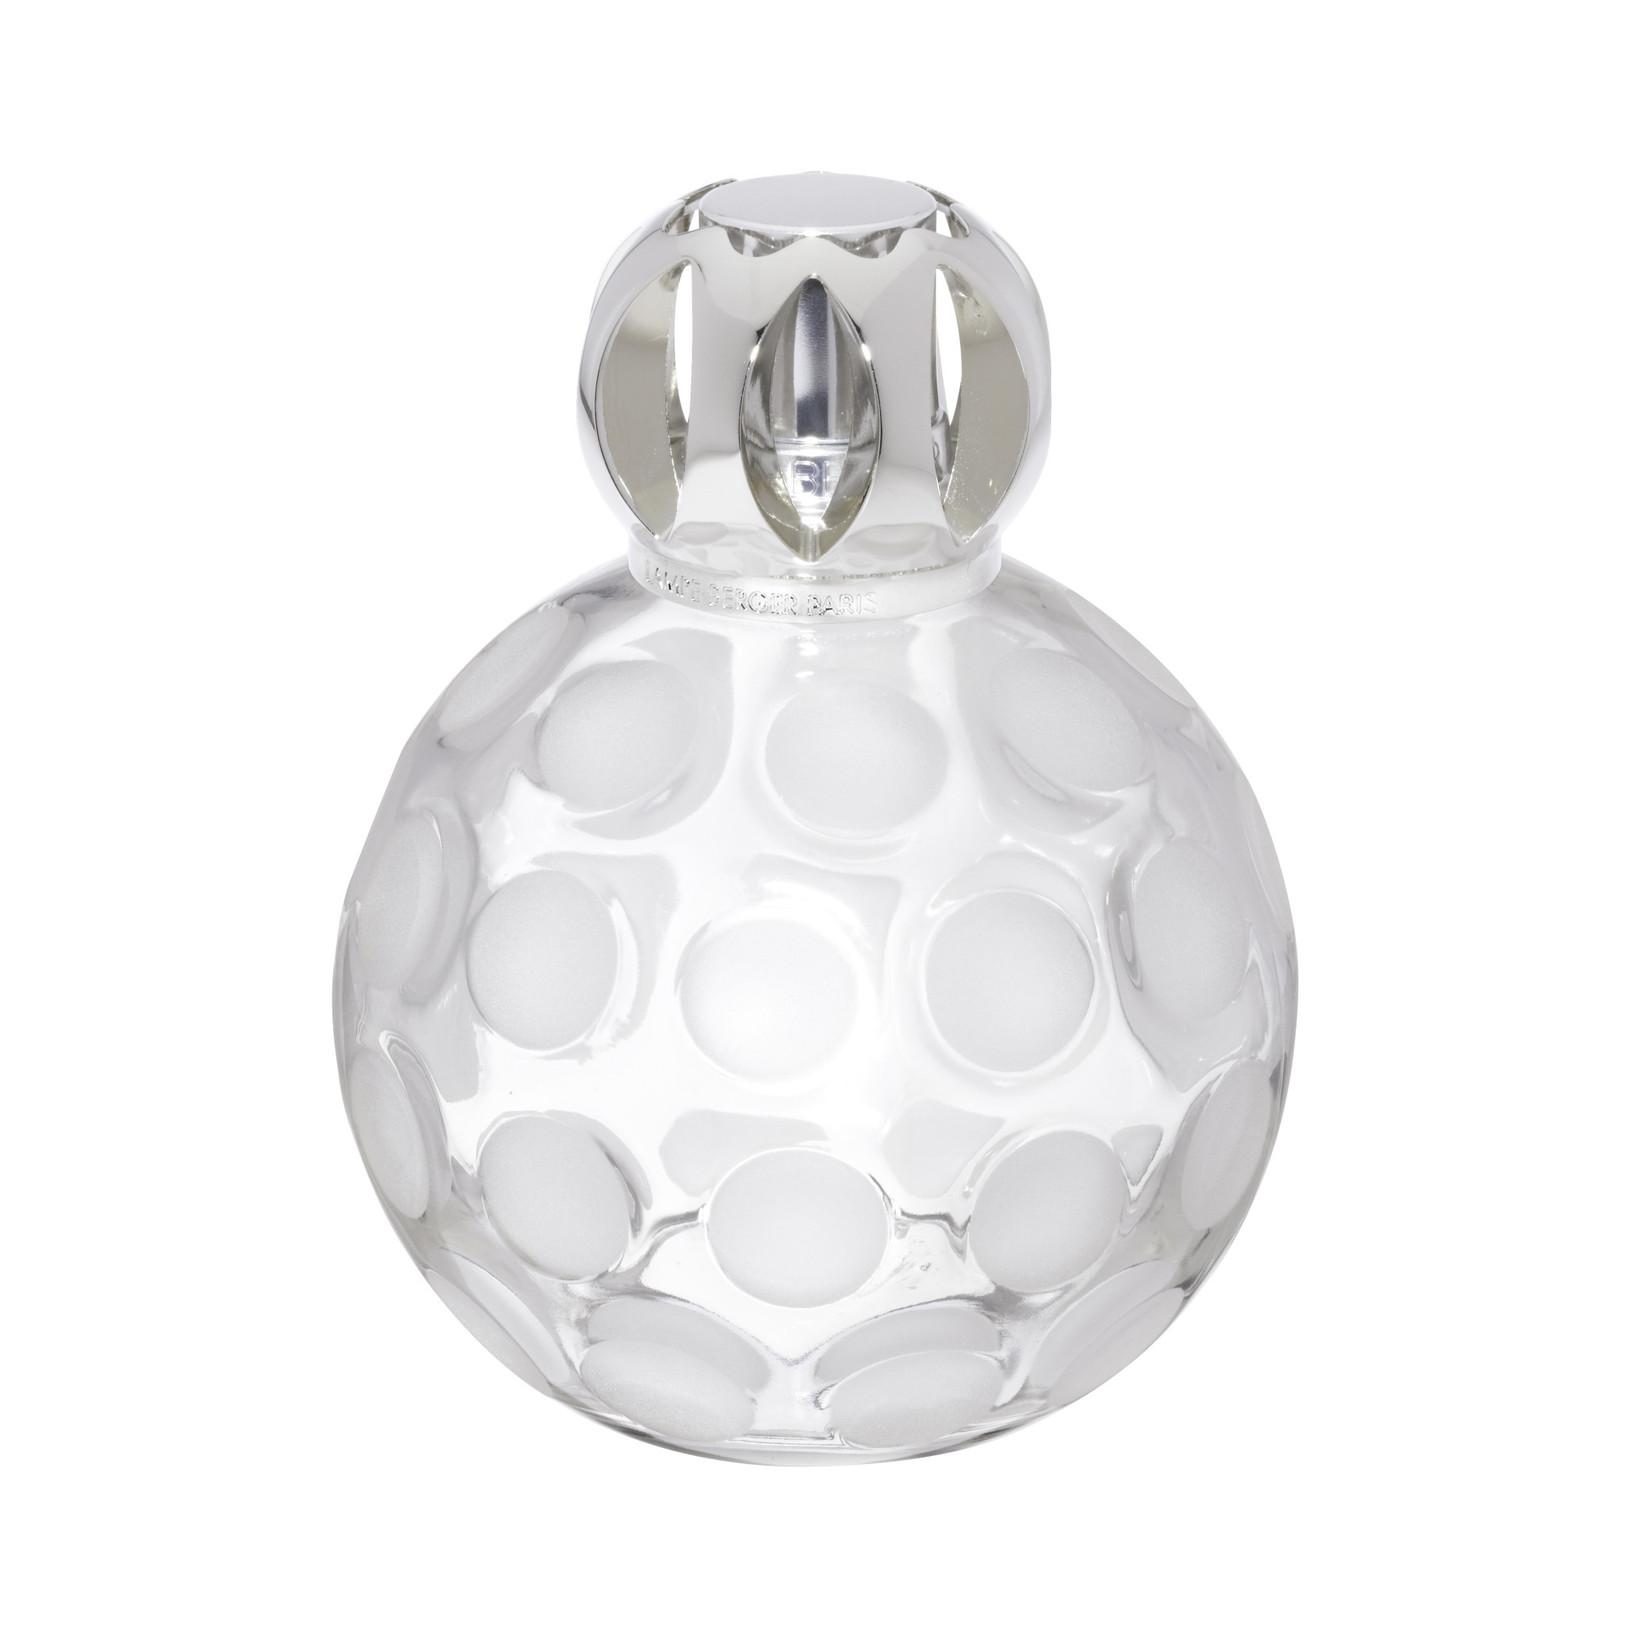 Lampe Berger Lampe Berger Luxe fles Frosted  Dots  met zilver